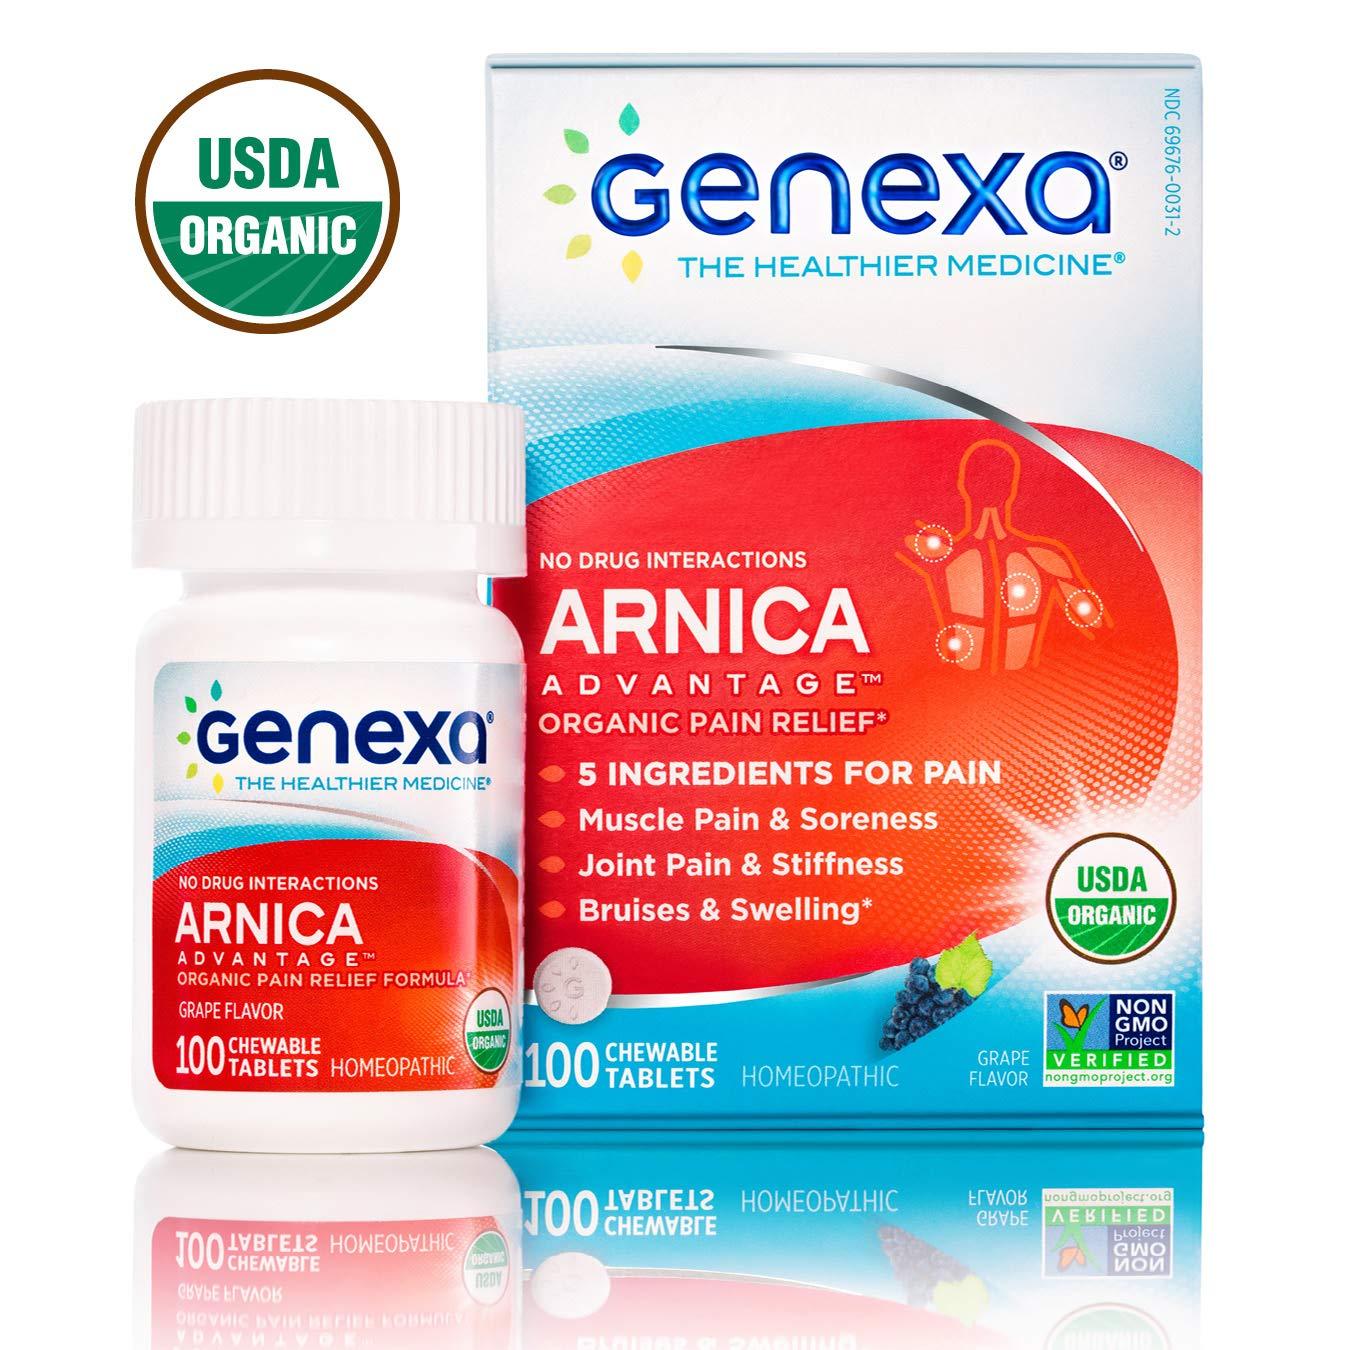 Genexa Arnica Advantage | Certified Organic & Non-GMO, Physician  Formulated, Homeopathic | Pain